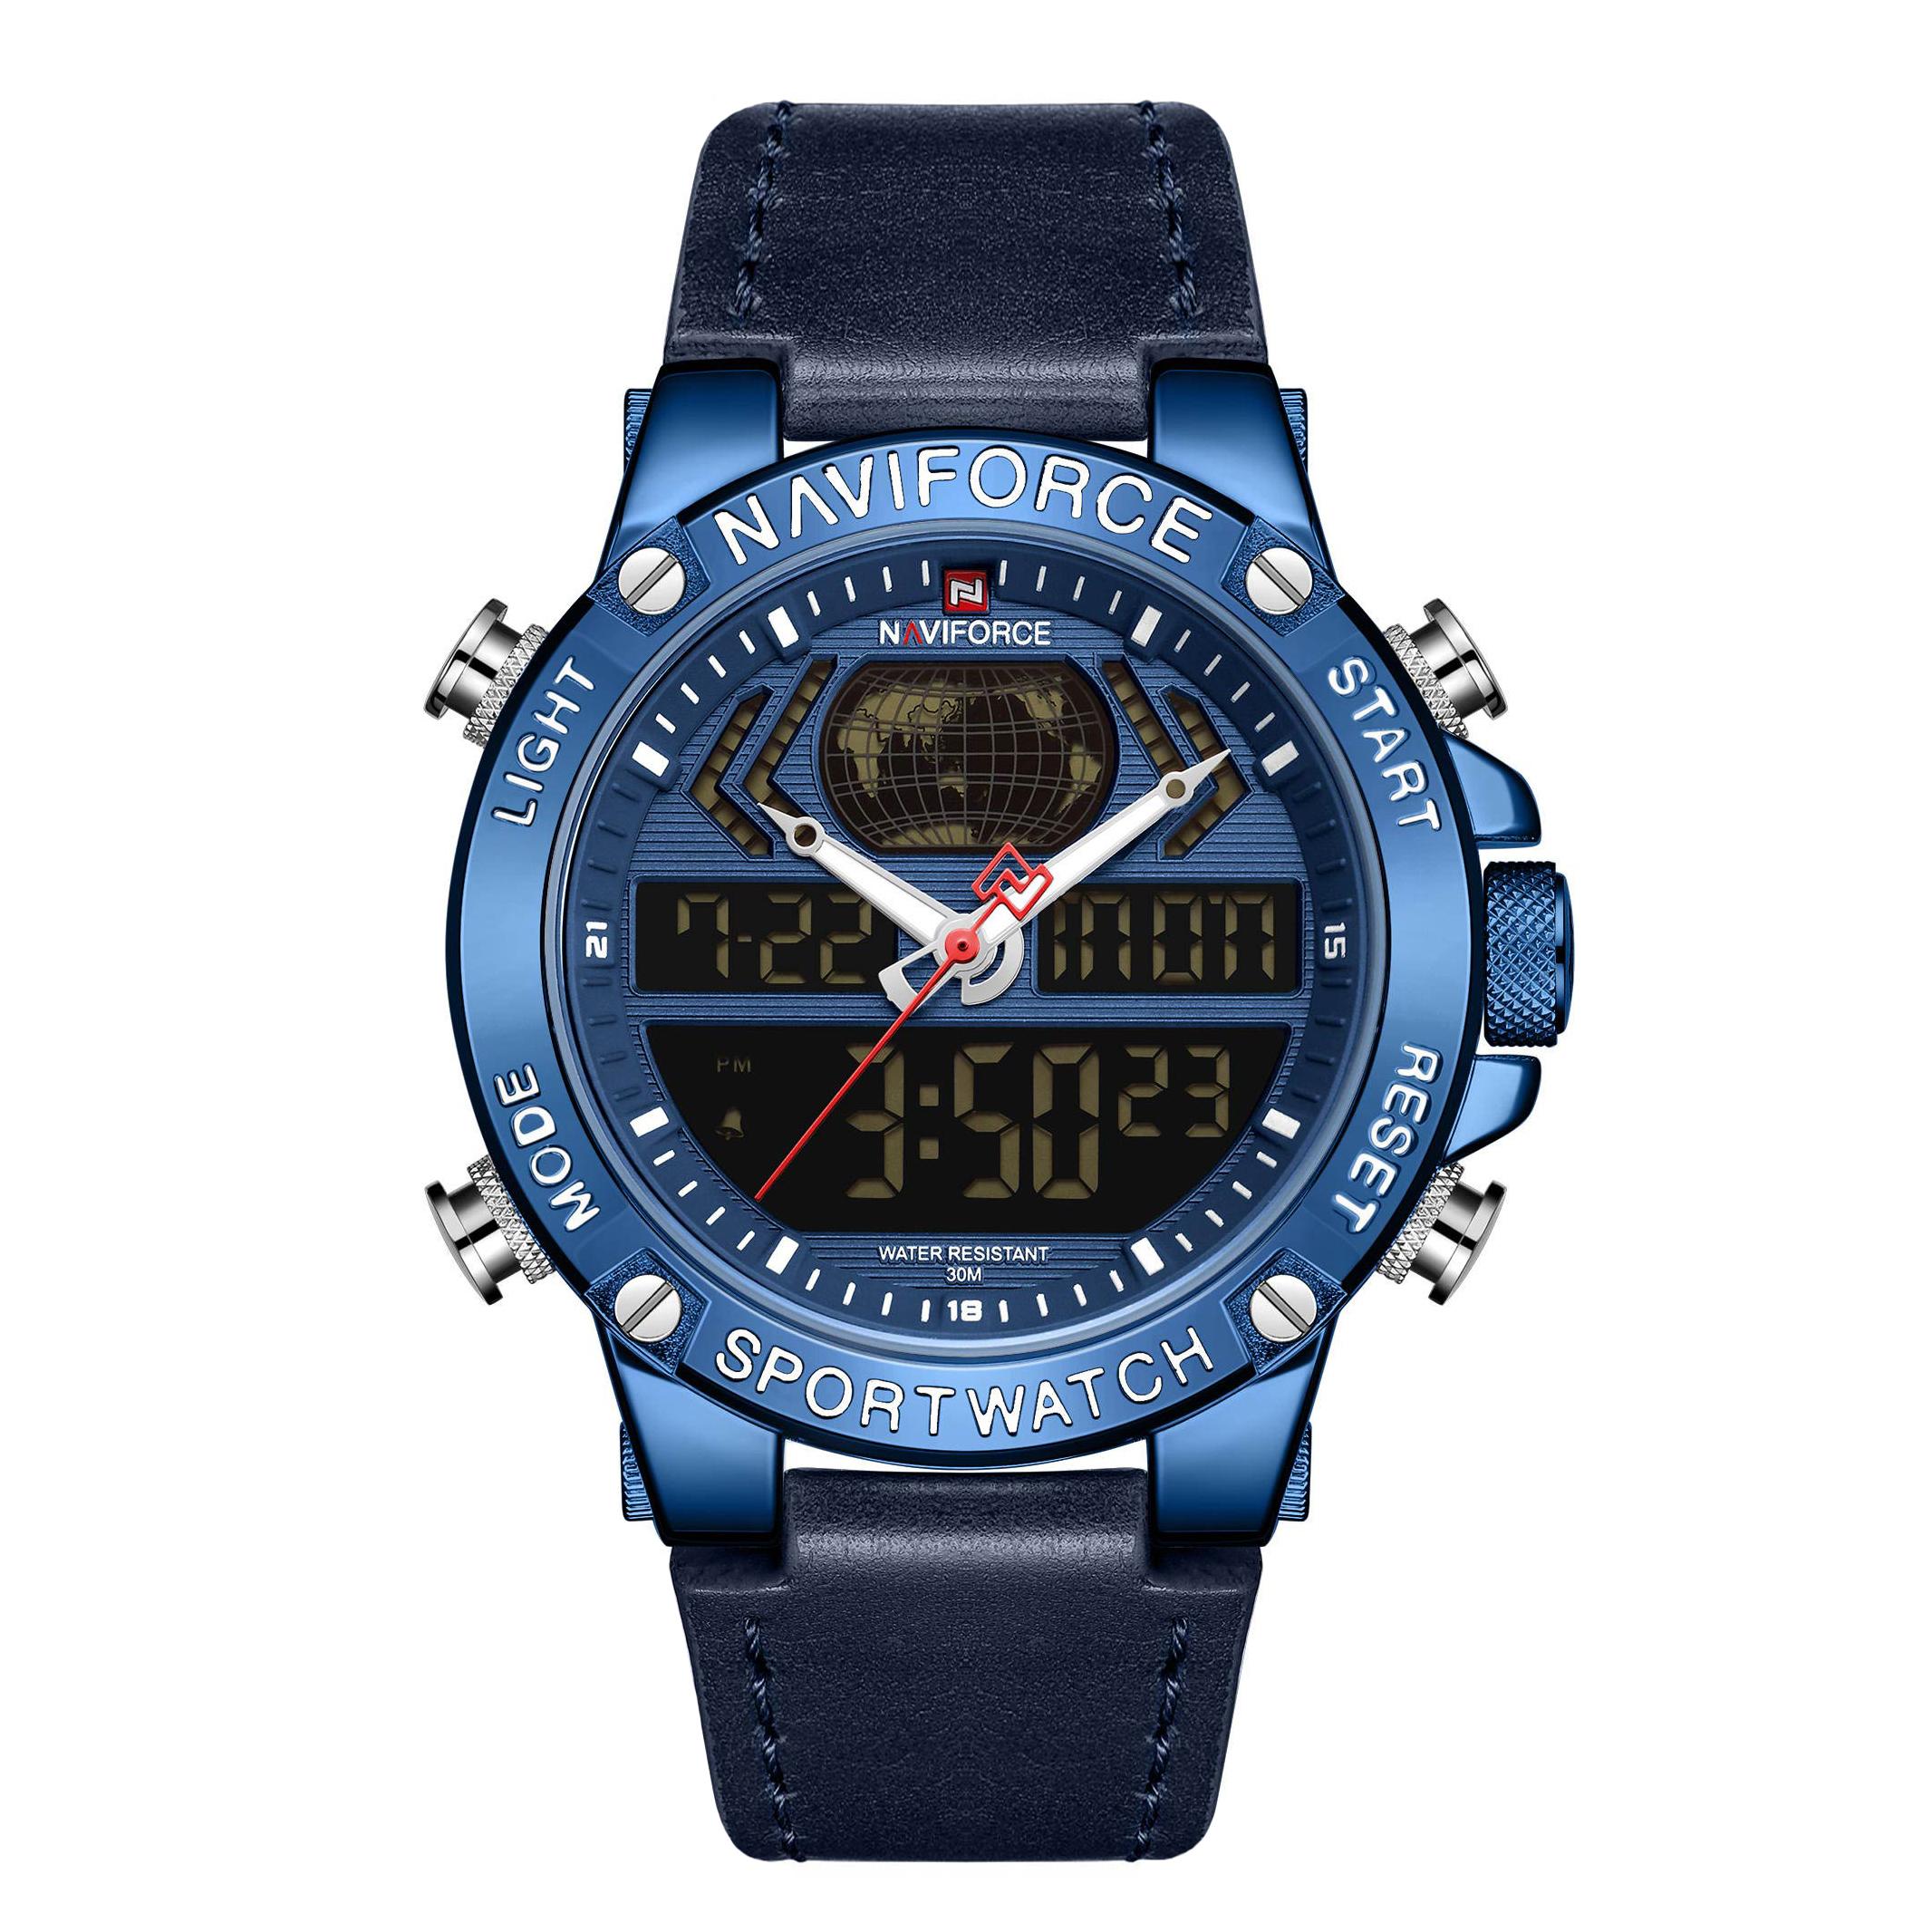 ساعت مچی دیجیتال مردانه نیوی فورس مدل NF9164M - SO